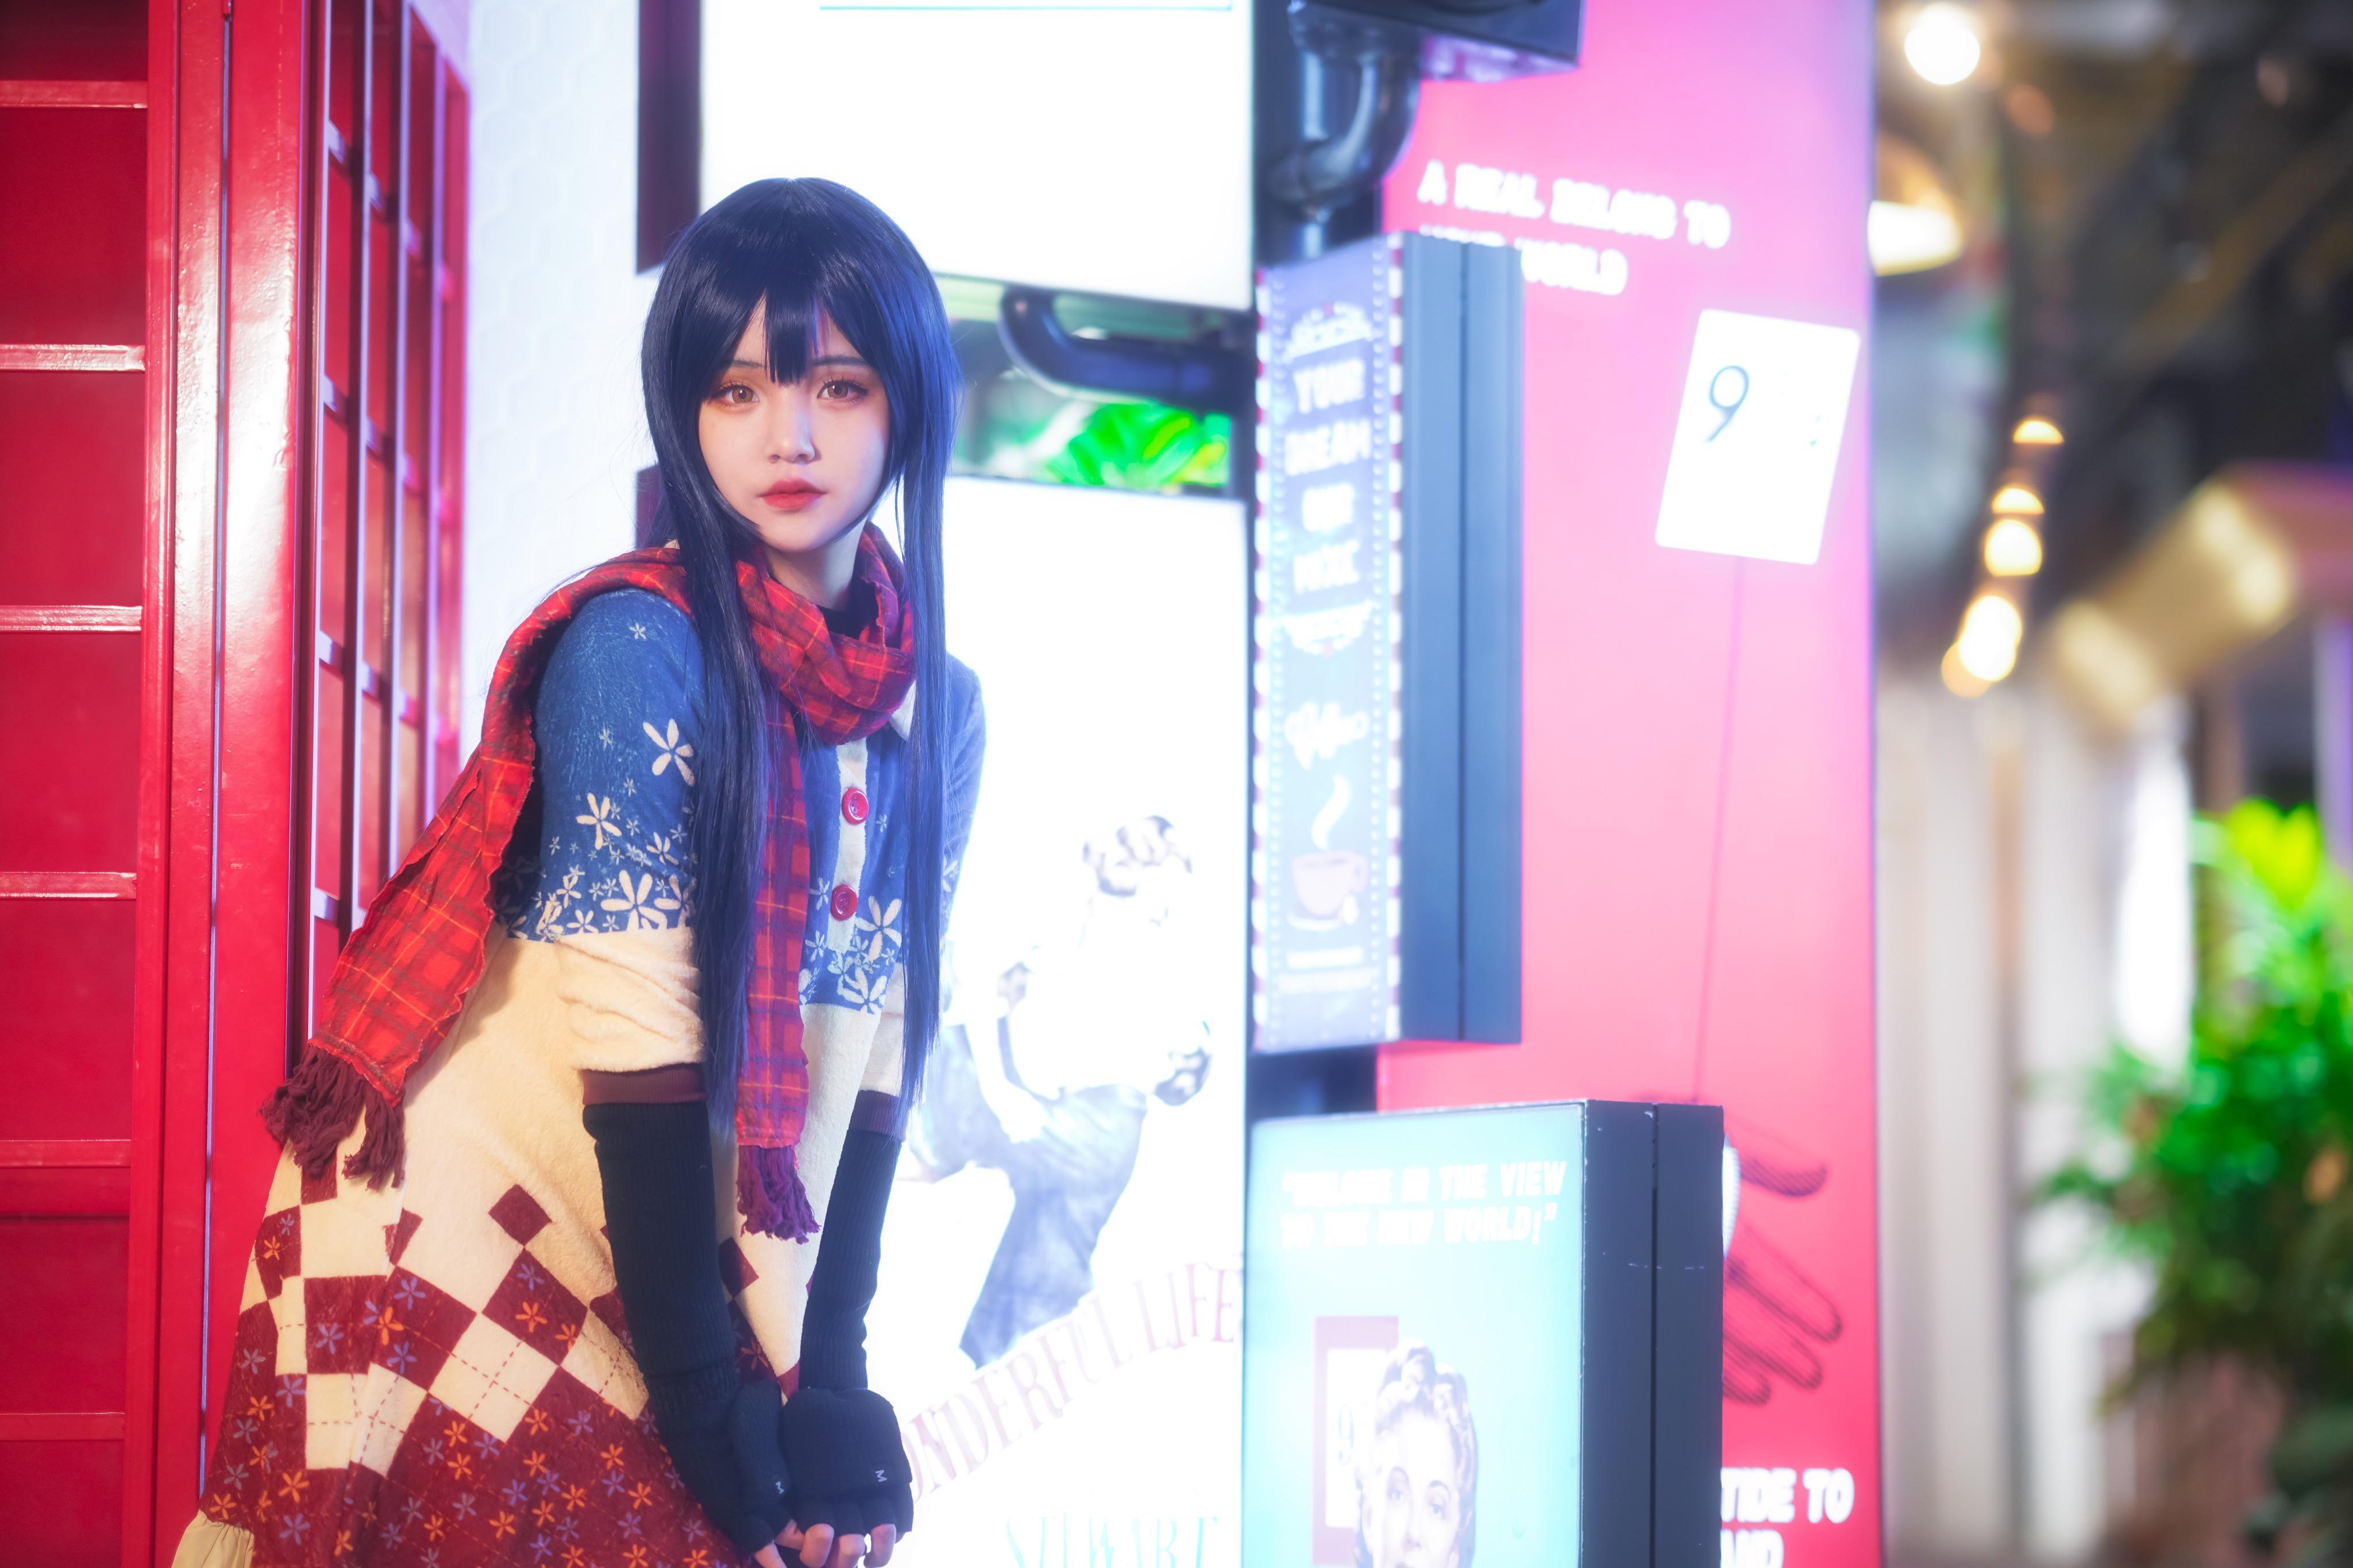 《LOVE LIVE!》漫展cosplay【CN:可森】-第2张